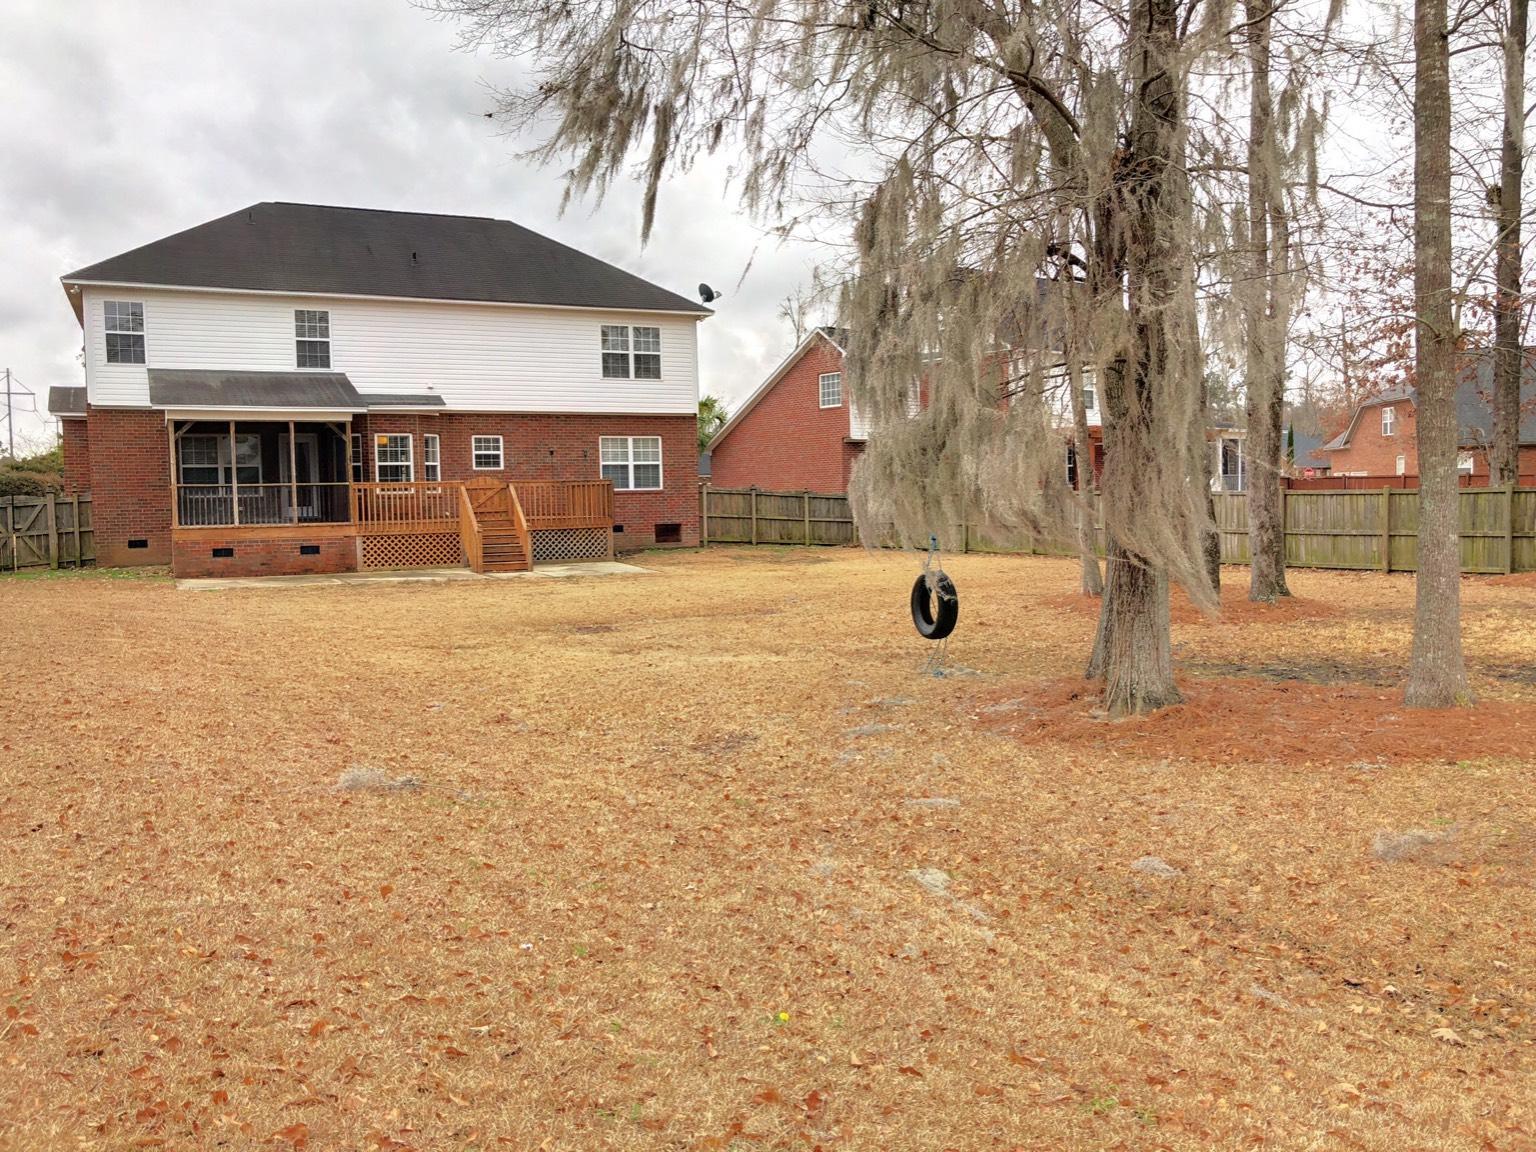 Photo of 105 Shakespeare Ct, Goose Creek, SC 29445